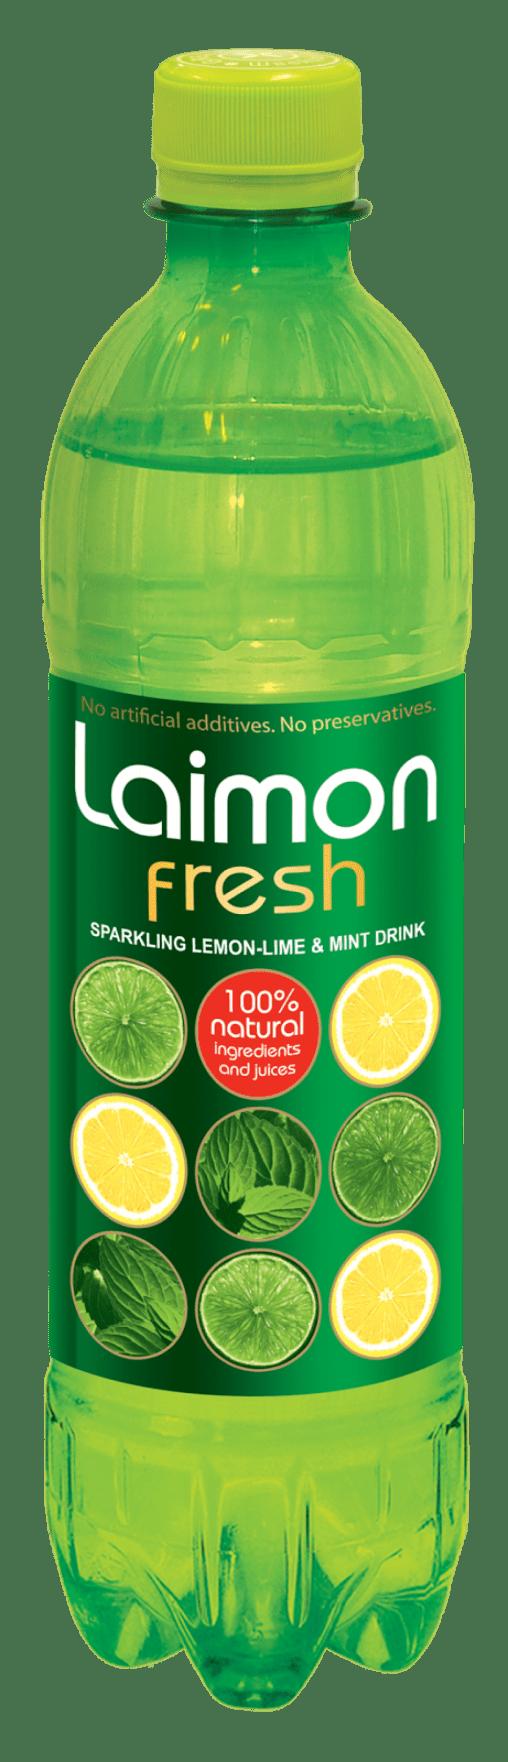 Газированный напиток Laimon Fresh 500 мл ПЭТ